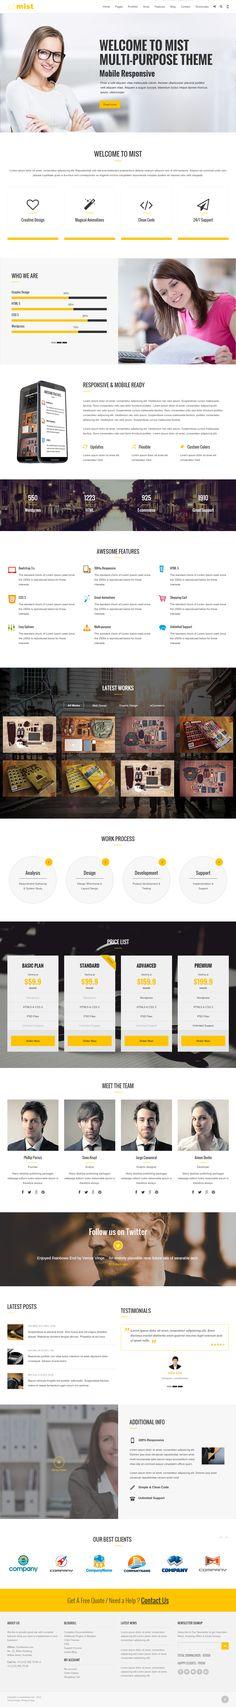 PaperPlane is Premium Responsive Retina HTML5 Portfolio Template ...